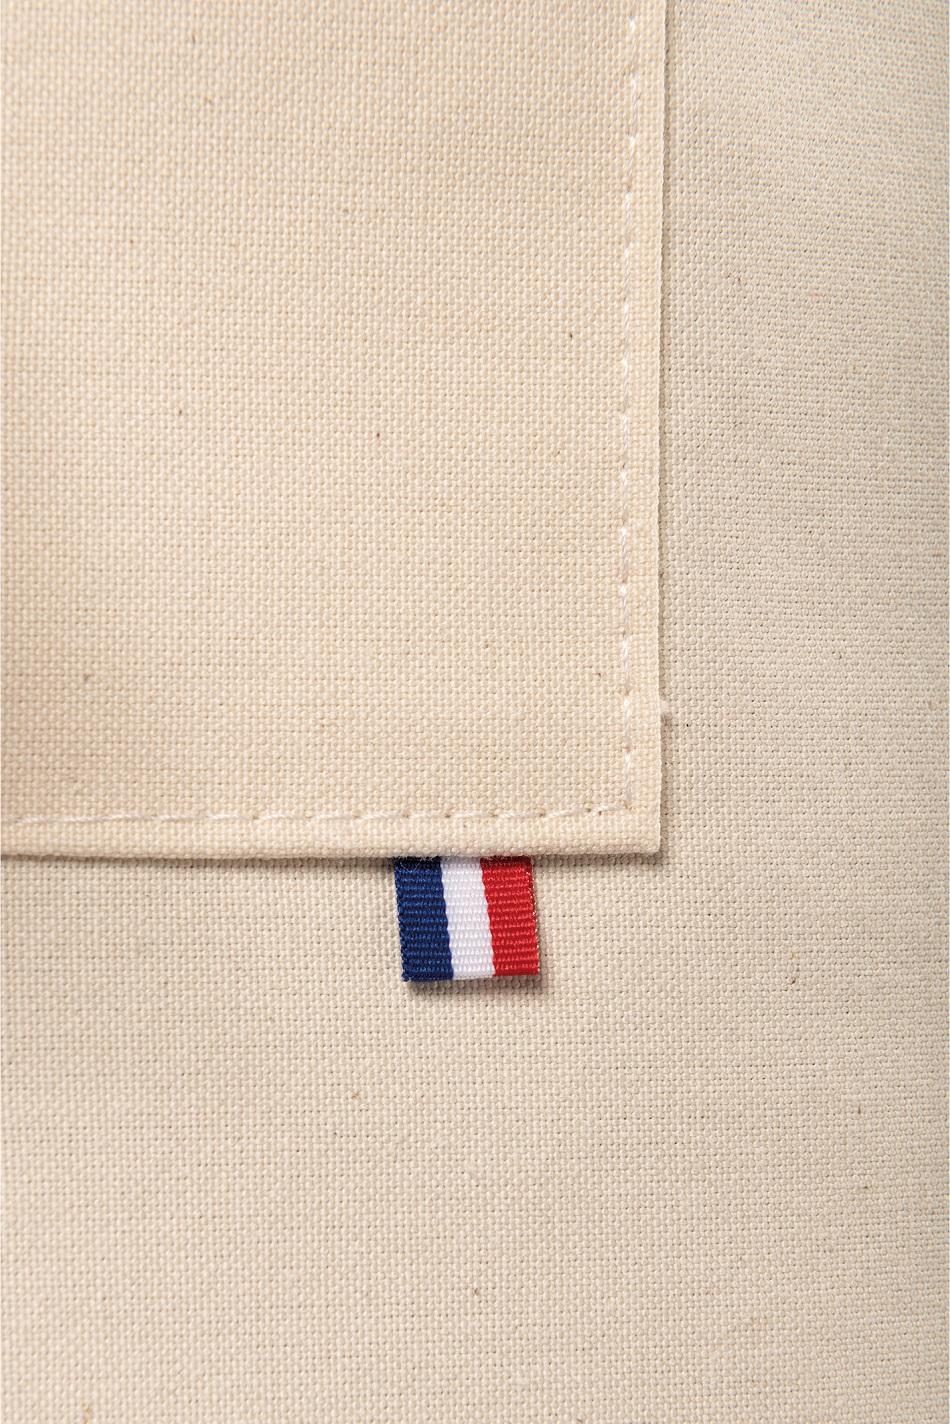 Tablier coton France